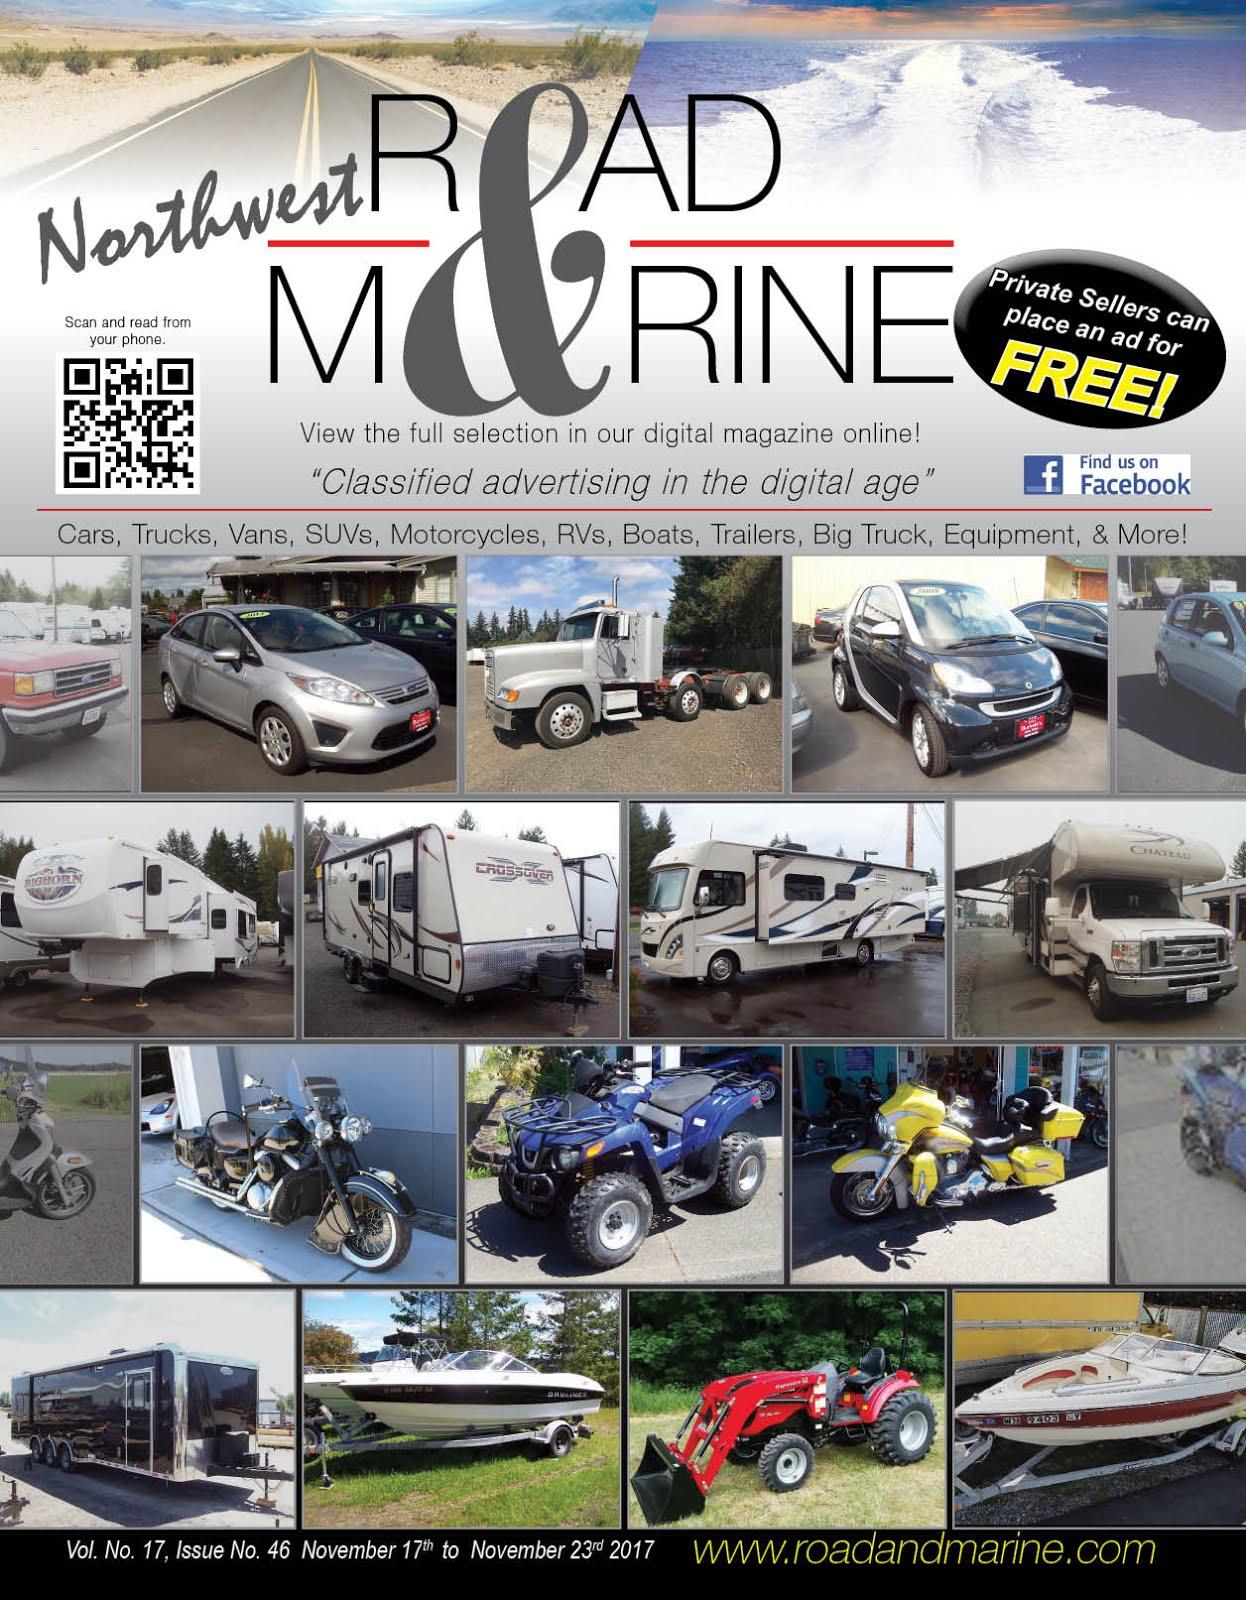 NW Road & Marine Glossy & Digital Magazines!!